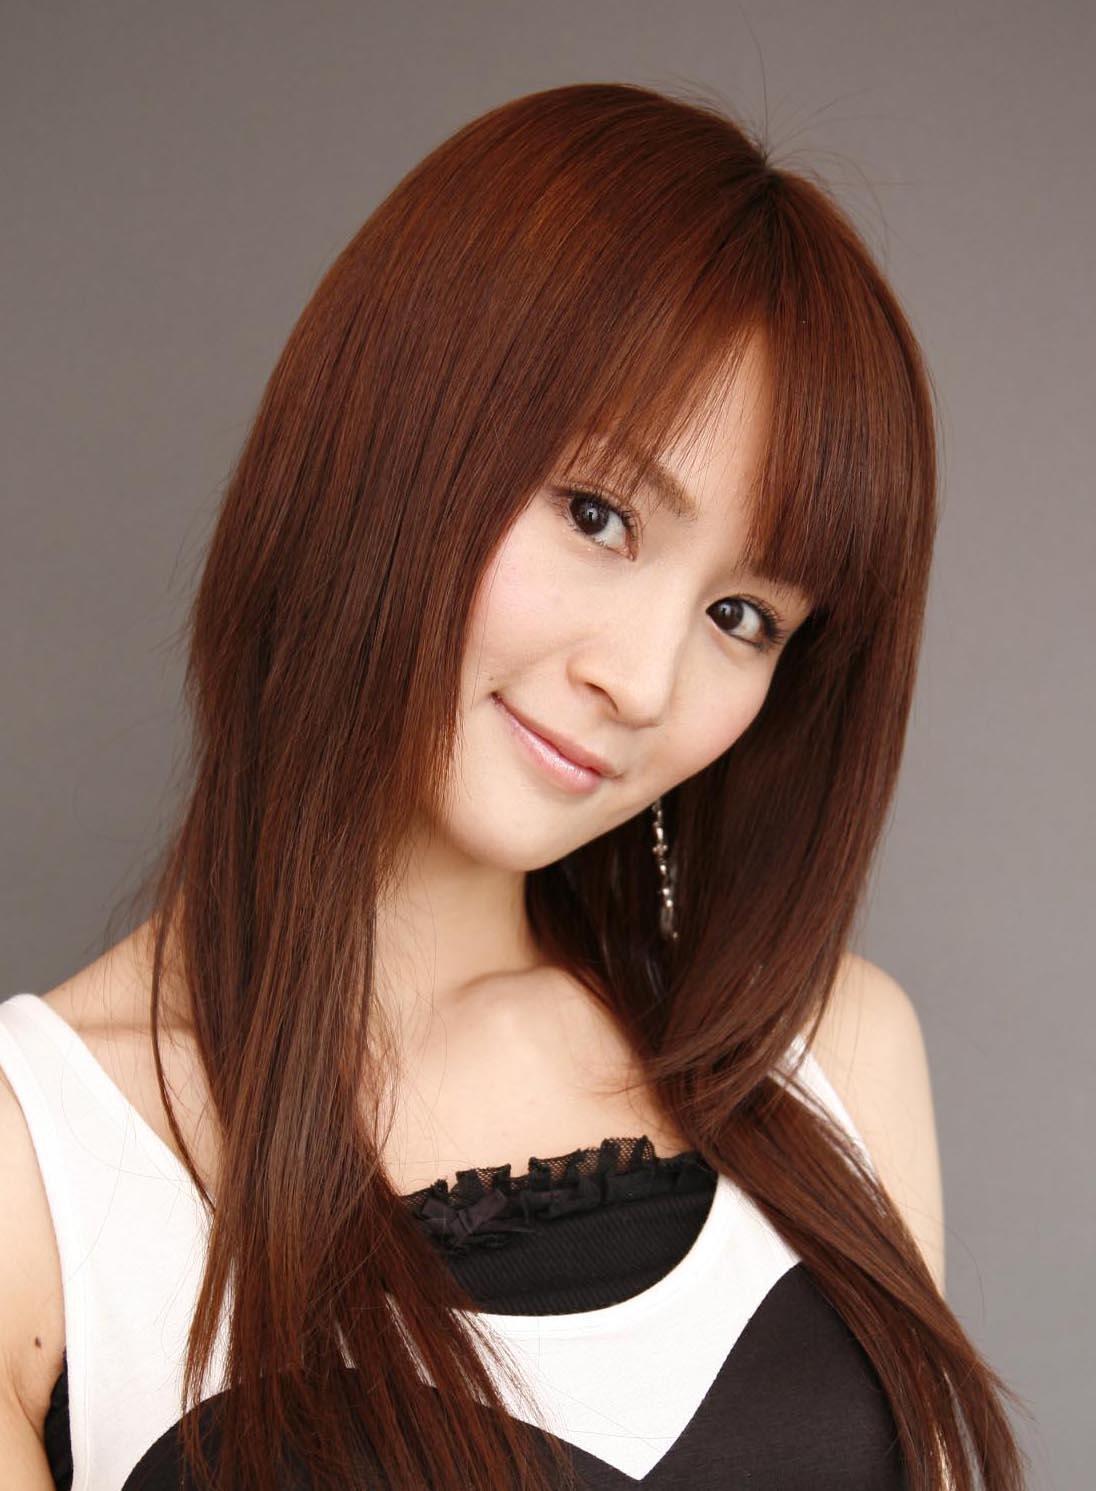 is the voice actor yu kobayashi possibly sick beautys face o109614911275477611032.jpg?resize=300,169 - 声優・小林ゆうはもしかして病気なの?美人の顔の裏側に迫る!